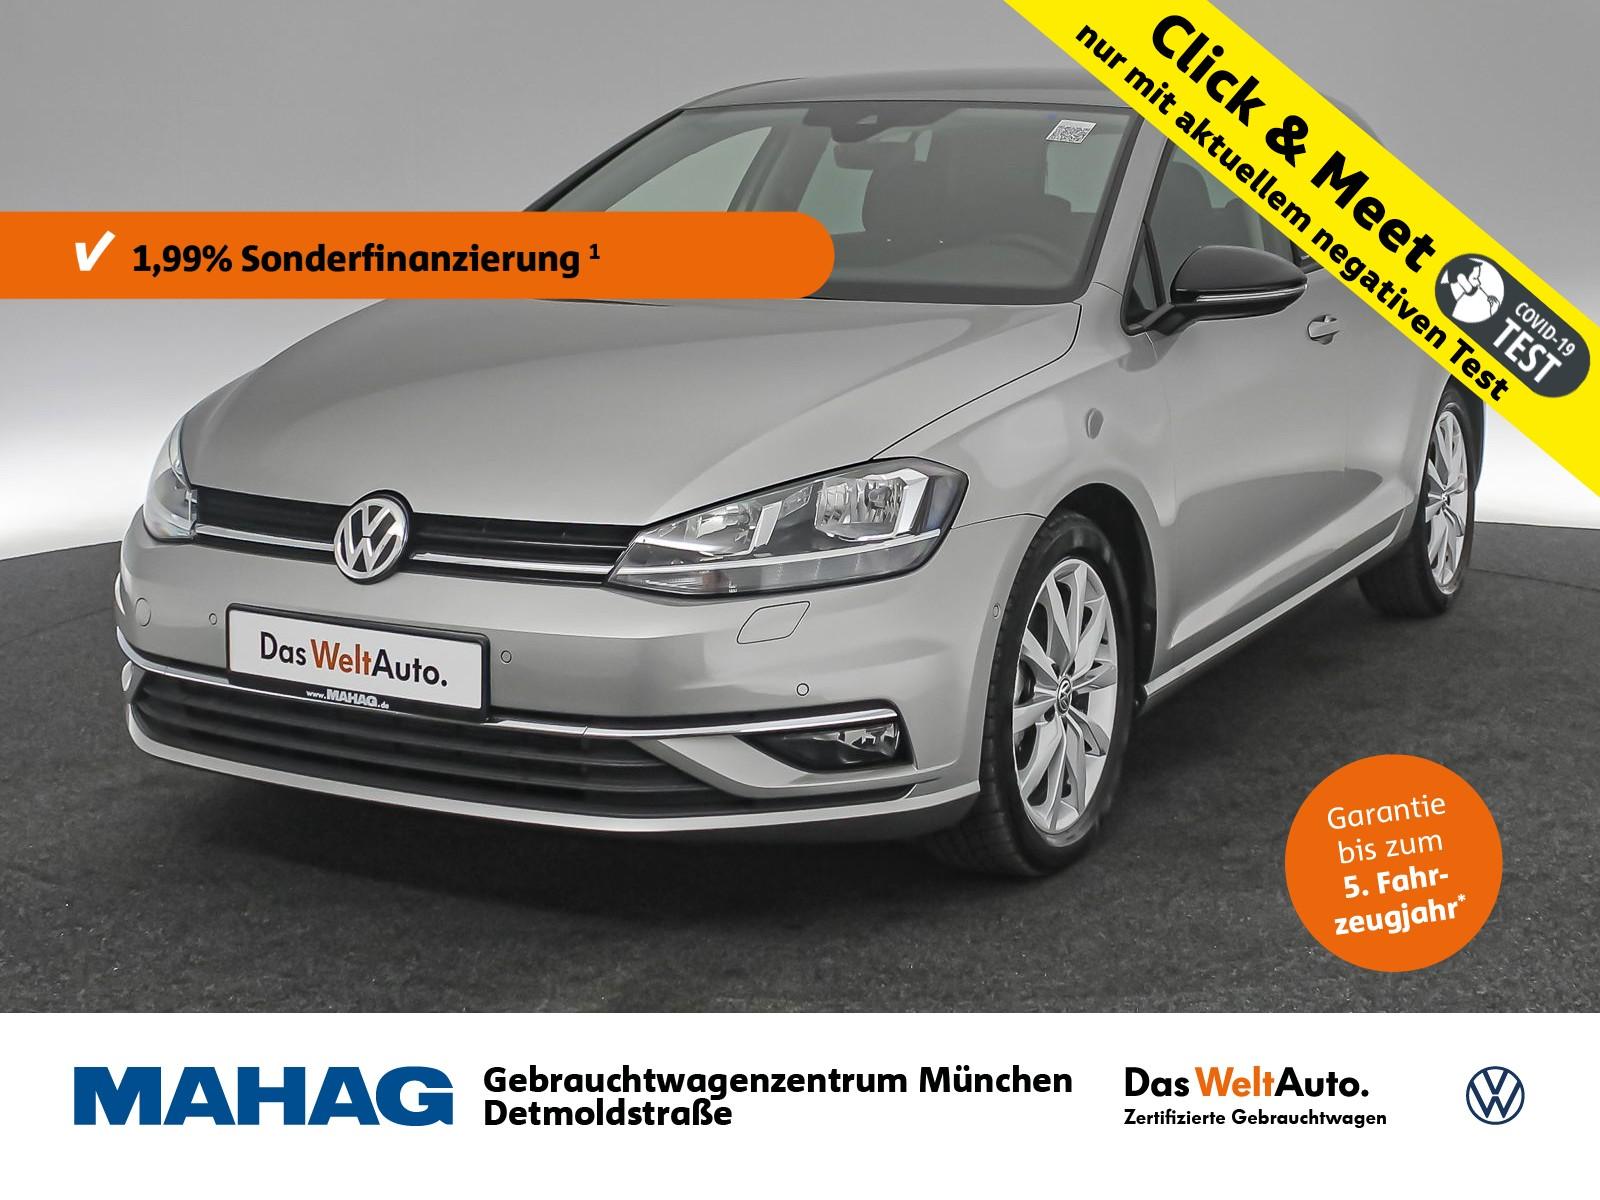 Volkswagen Golf VII 1.5 TSI IQ.DRIVE Navi Standhz. Sitzhz. ParkAssist LightAssist FrontAssist 17Zoll 6-Gang, Jahr 2019, Benzin